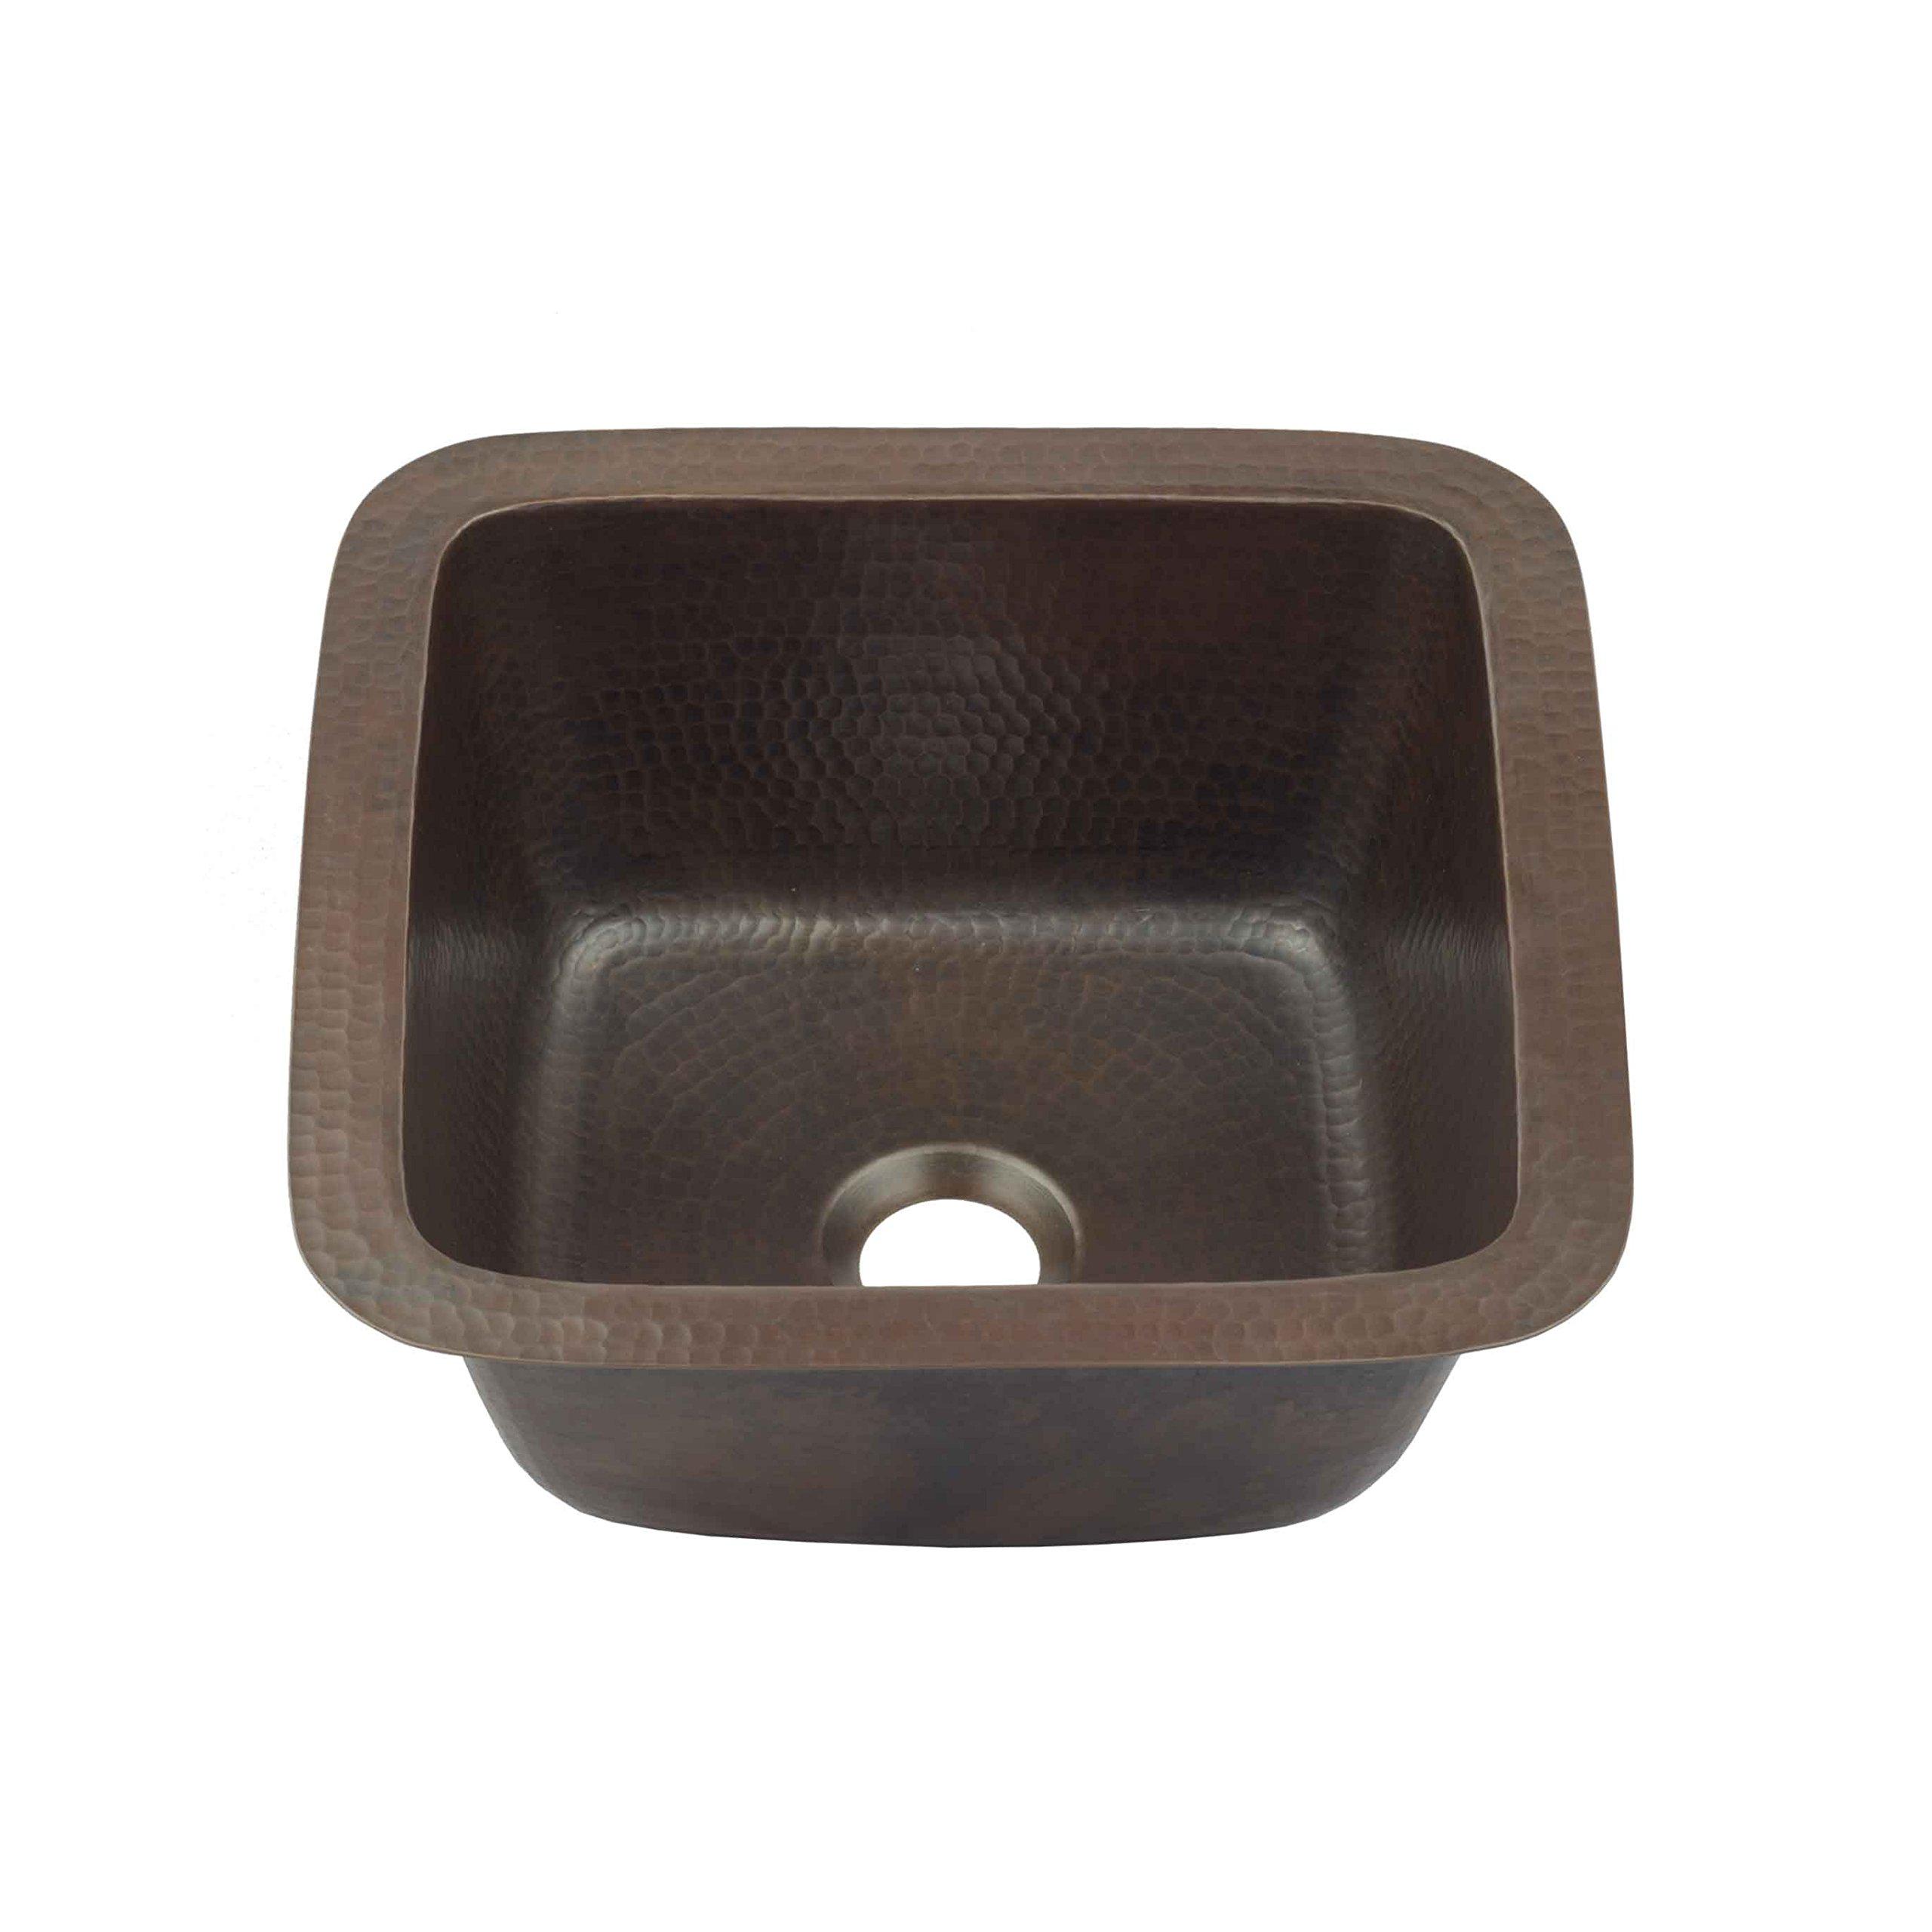 Sinkology P1U-1212BC Pollock Undermount Handmade Pure Solid 0-Hole Bar Prep Sink, 12'', Aged Copper by Sinkology